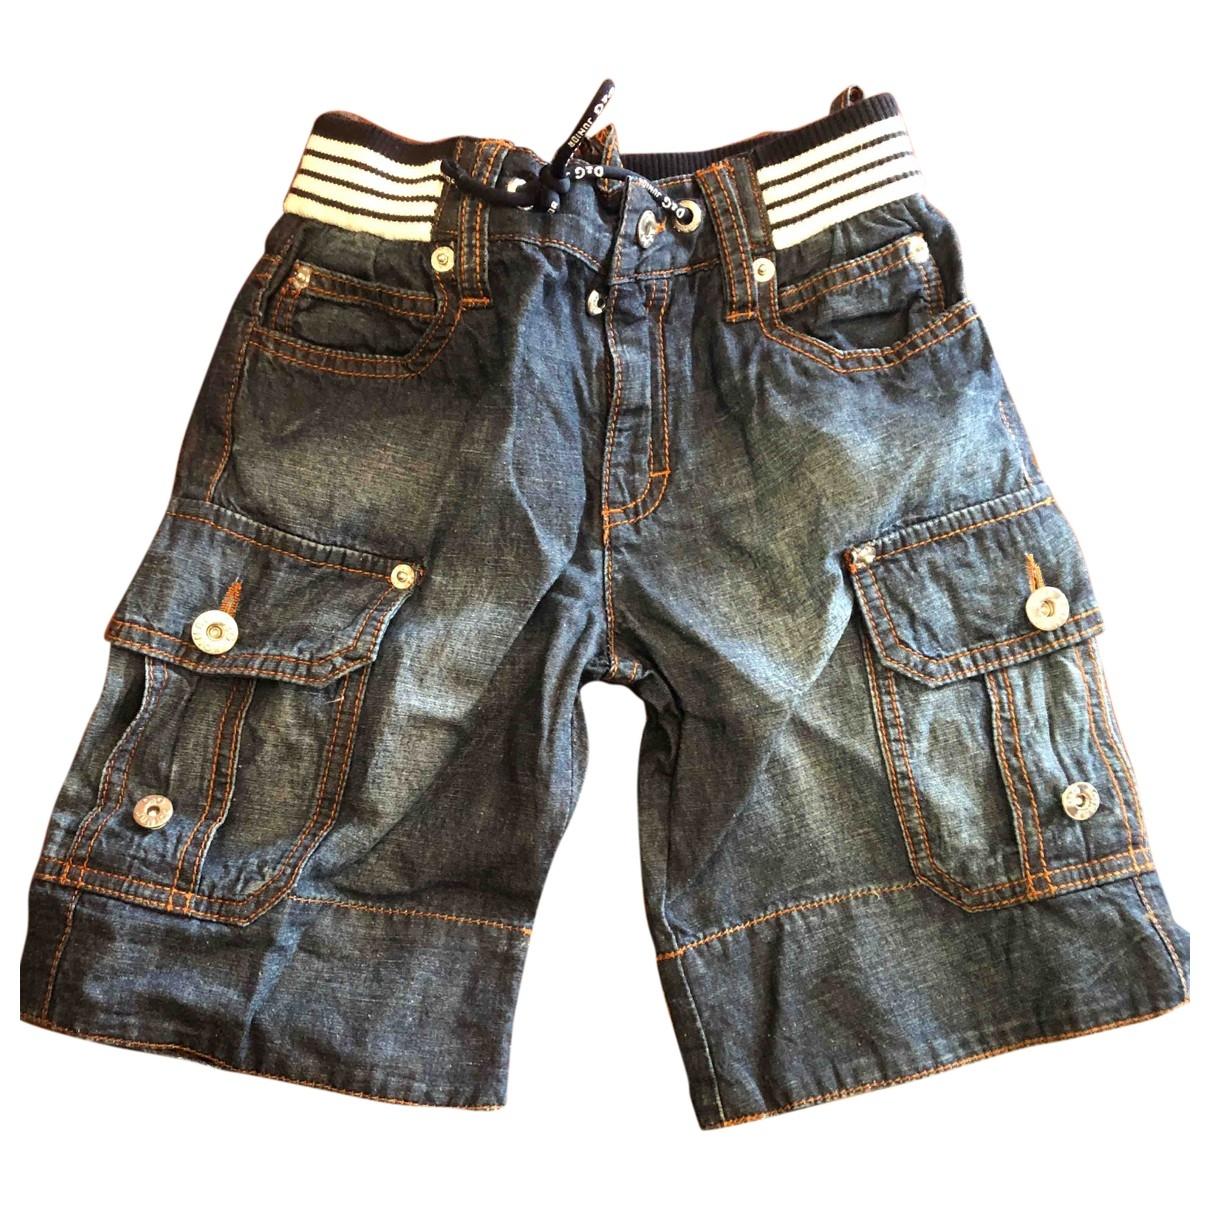 D&g \N Shorts in Denim - Jeans